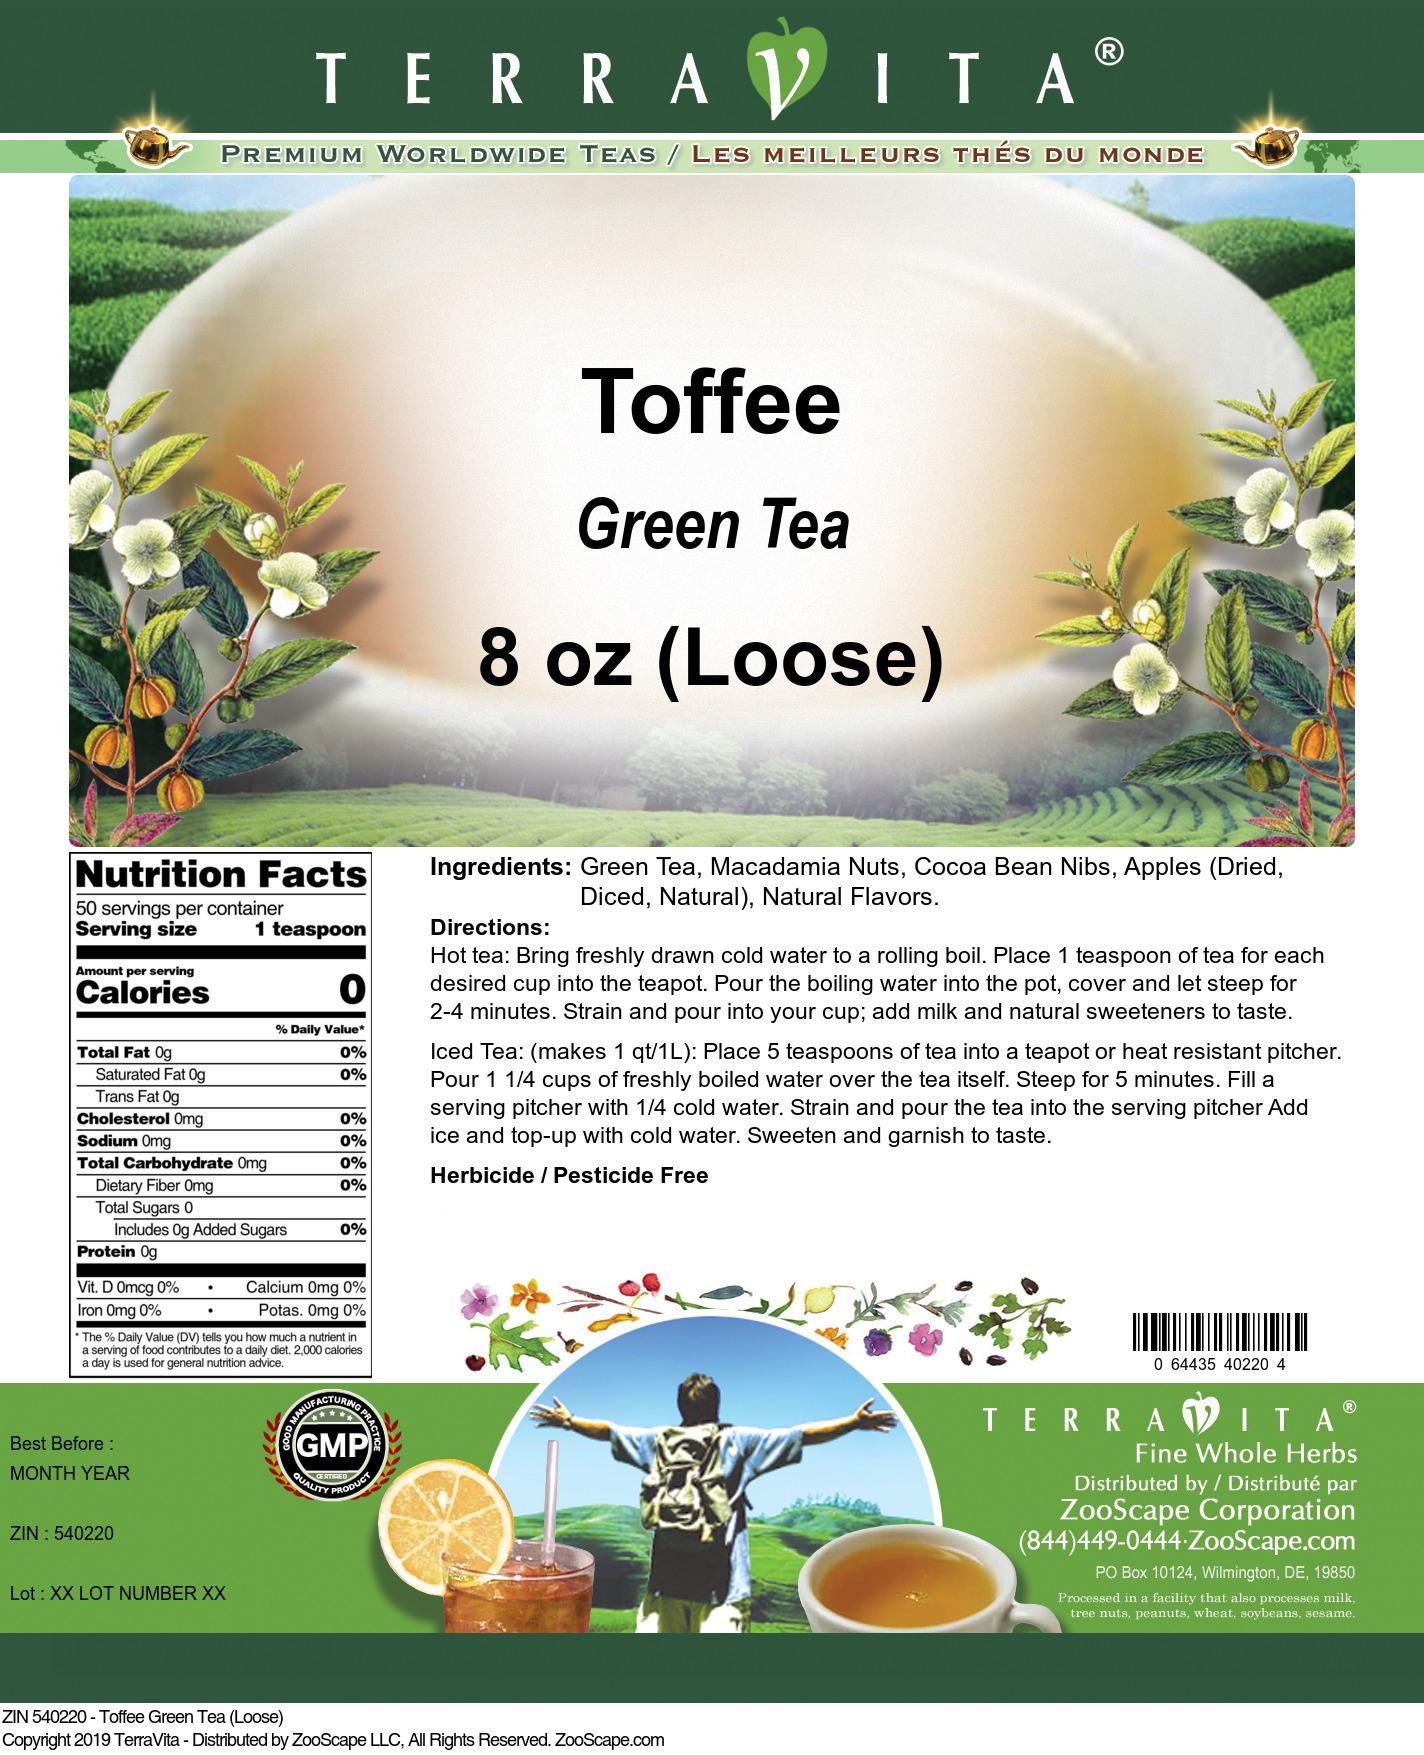 Toffee Green Tea (Loose)